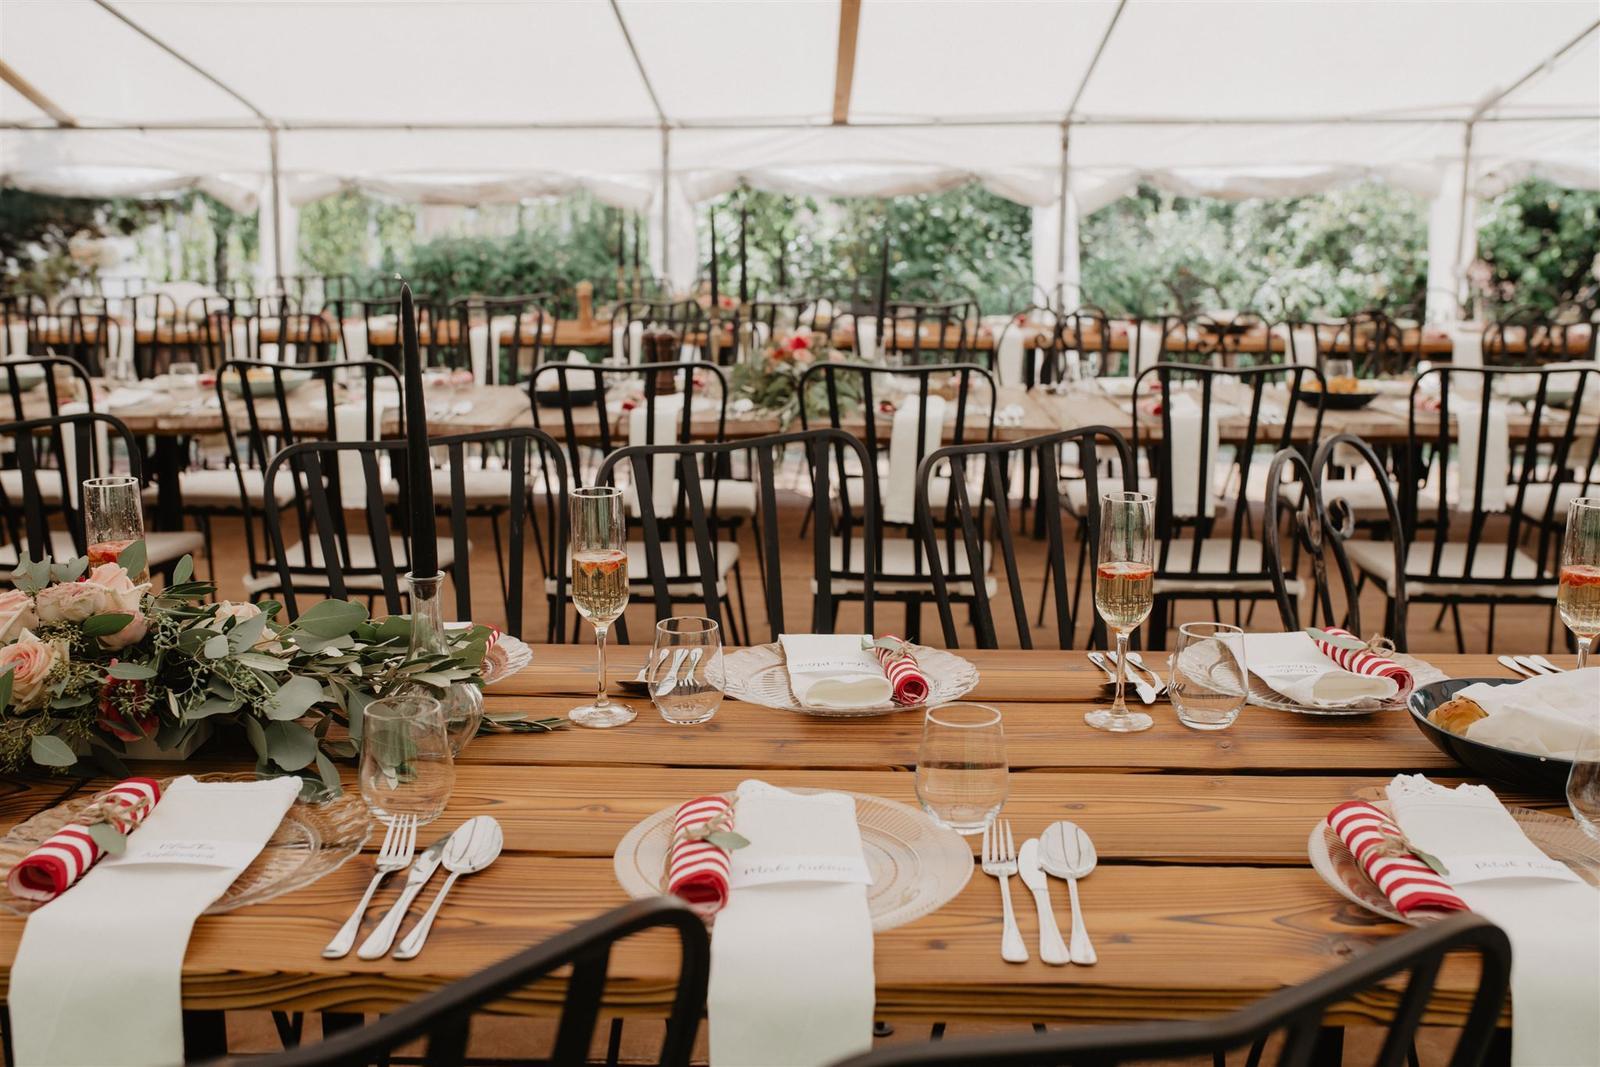 Krásna a romantická svadobná party v záhrade reštaurácie Bistra Dukát - Le Gout v srdci B. Bystrice. - Obrázok č. 12